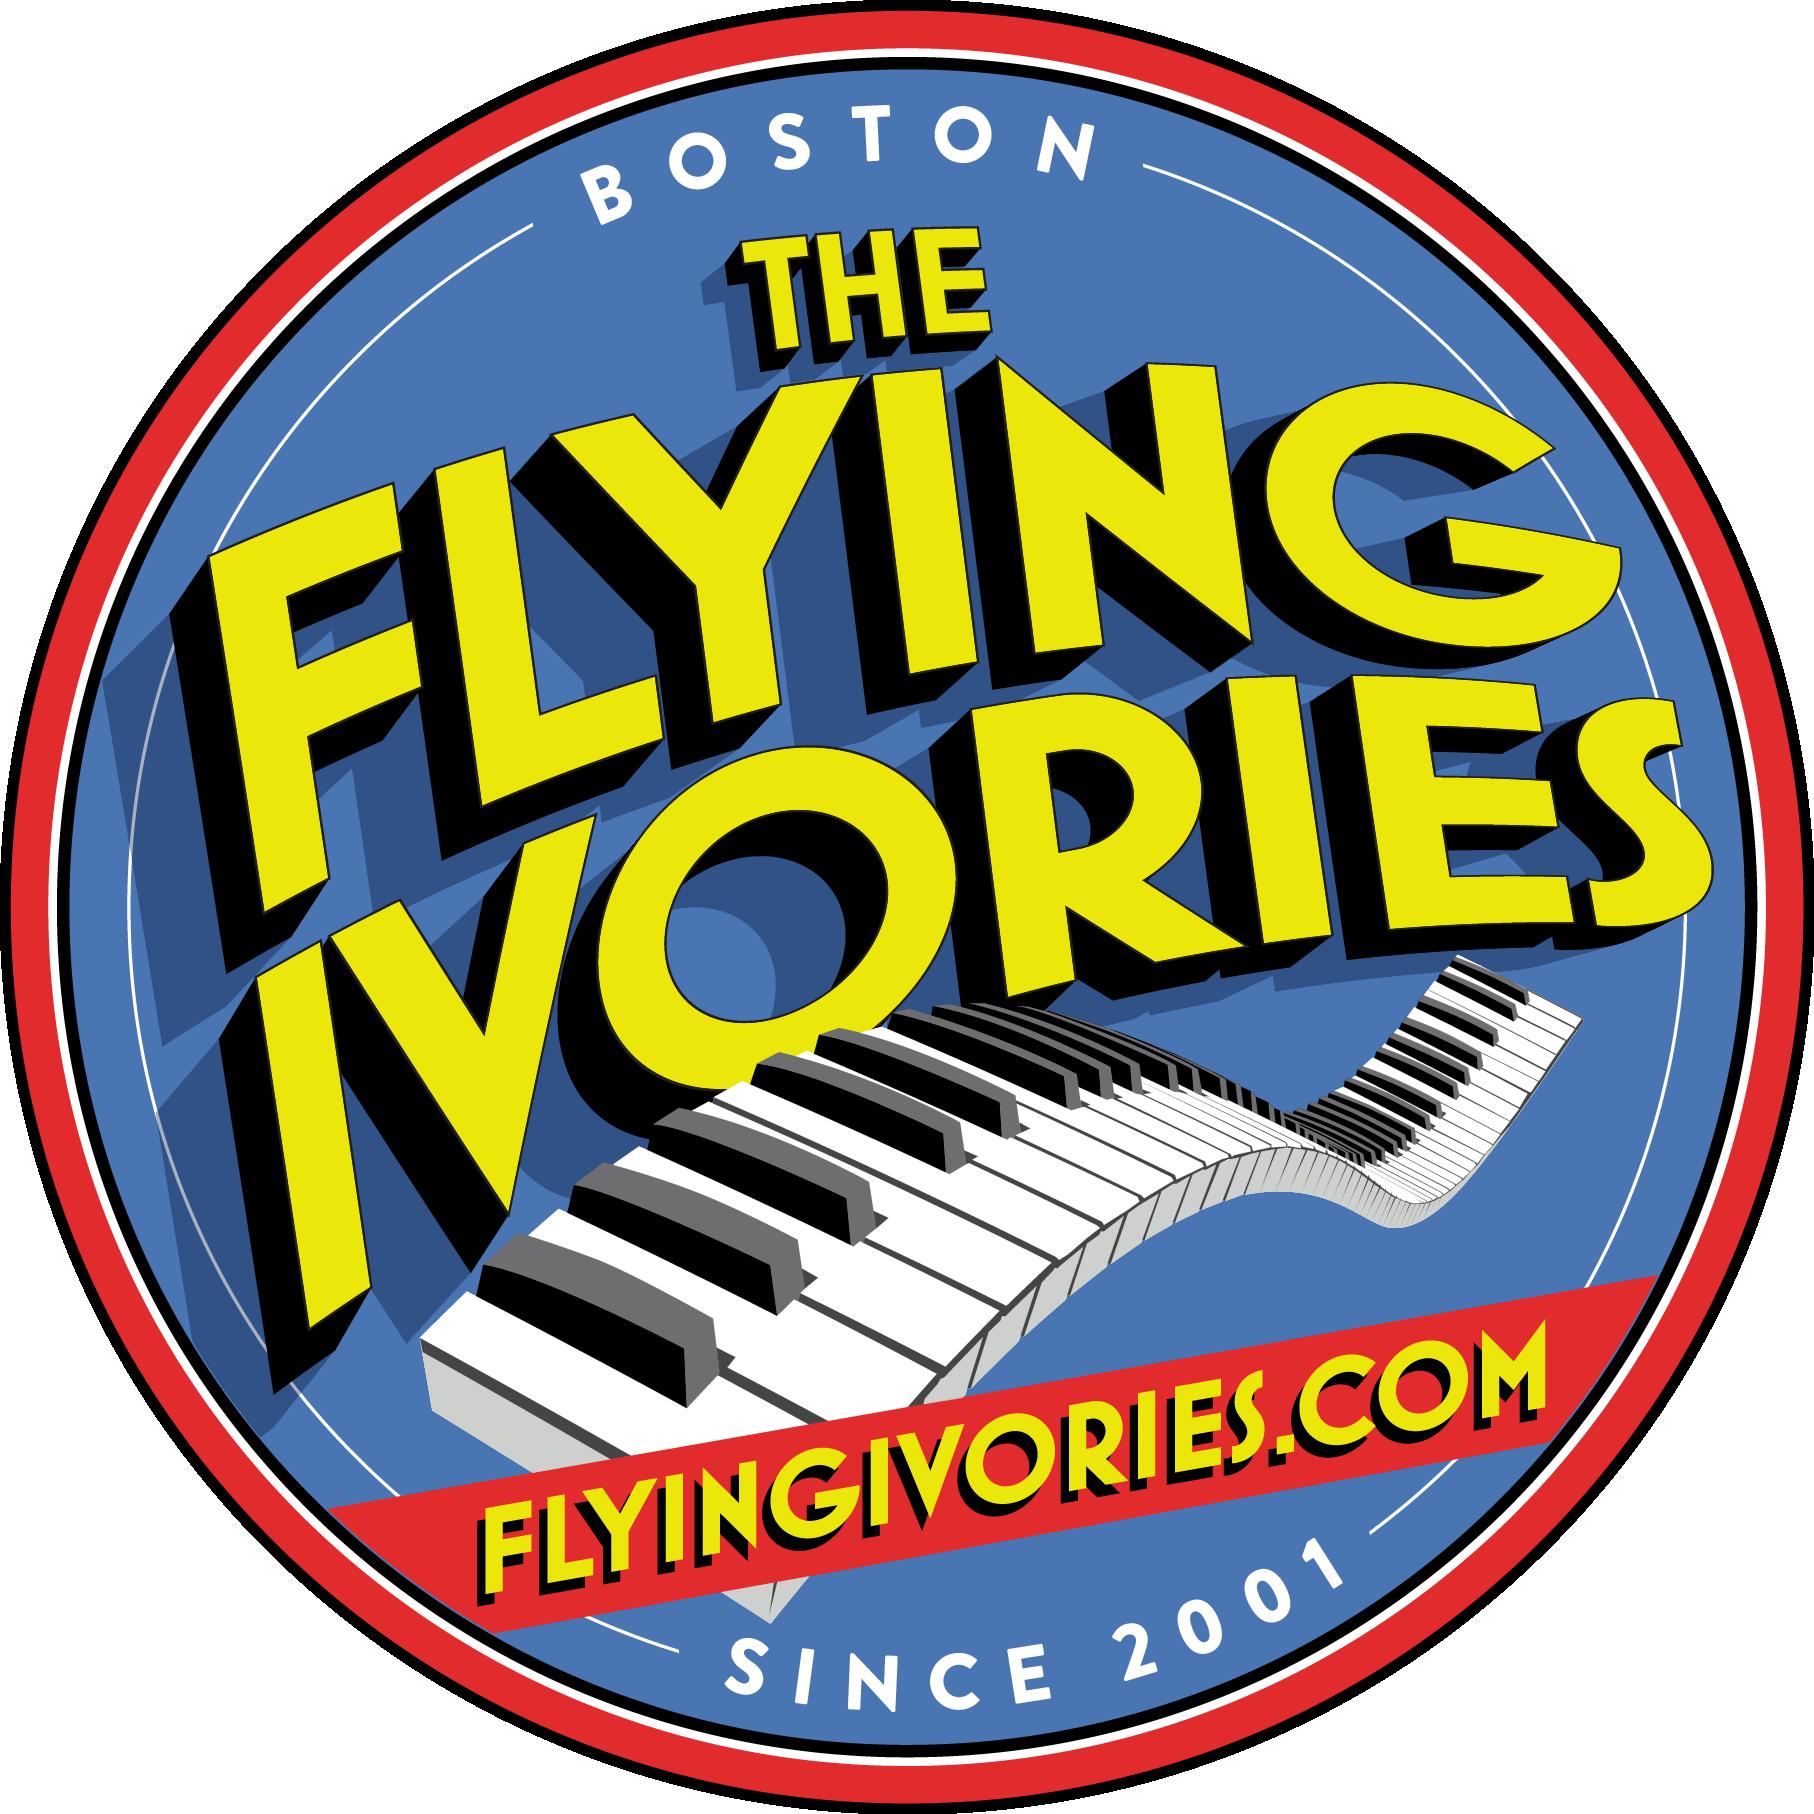 The Flying Ivories logo update